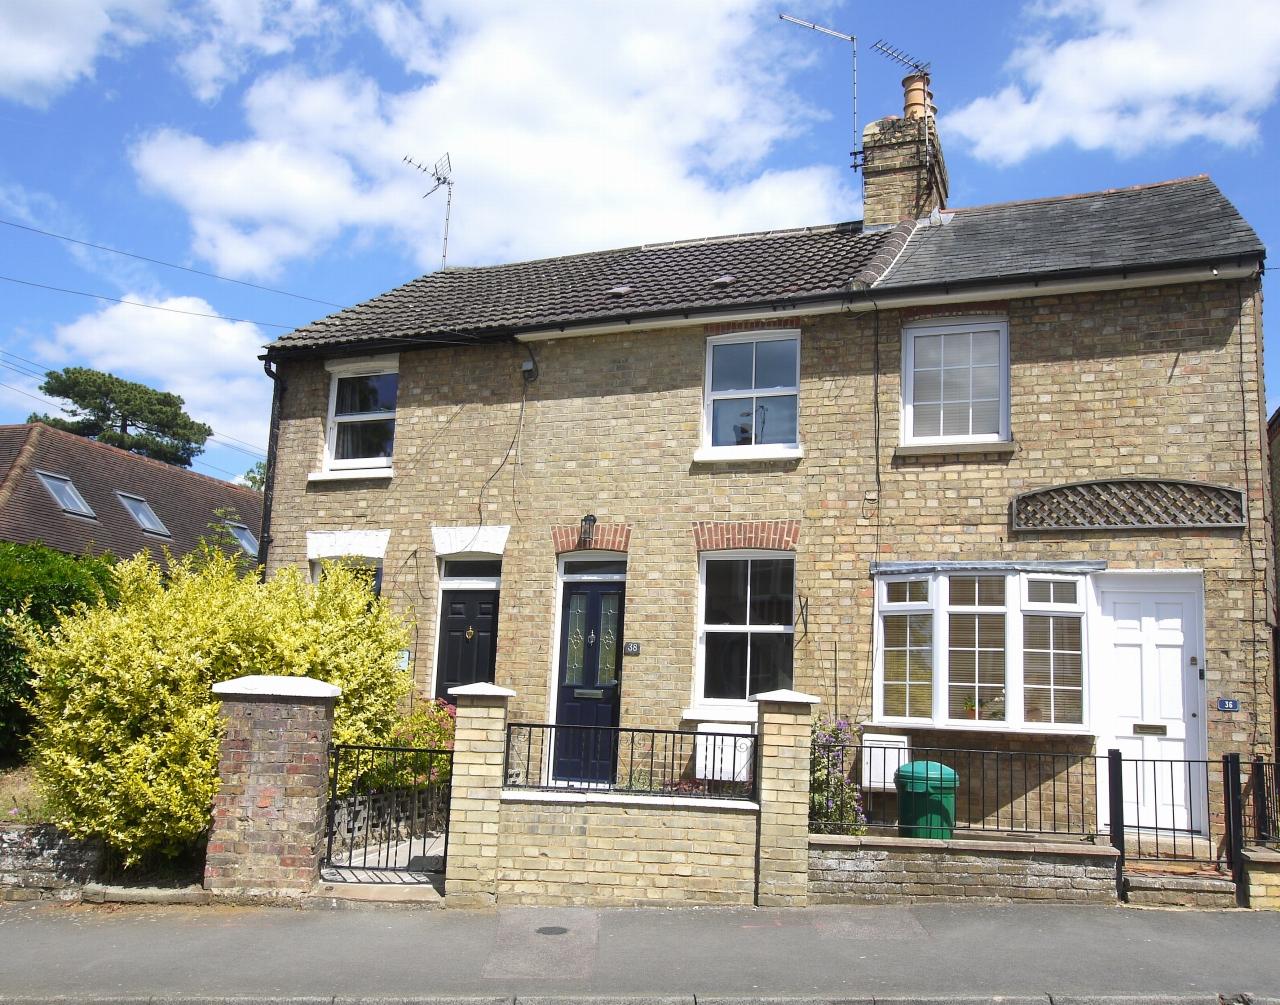 2 bedroom mid terraced house Sold in Sevenoaks - Photograph 2